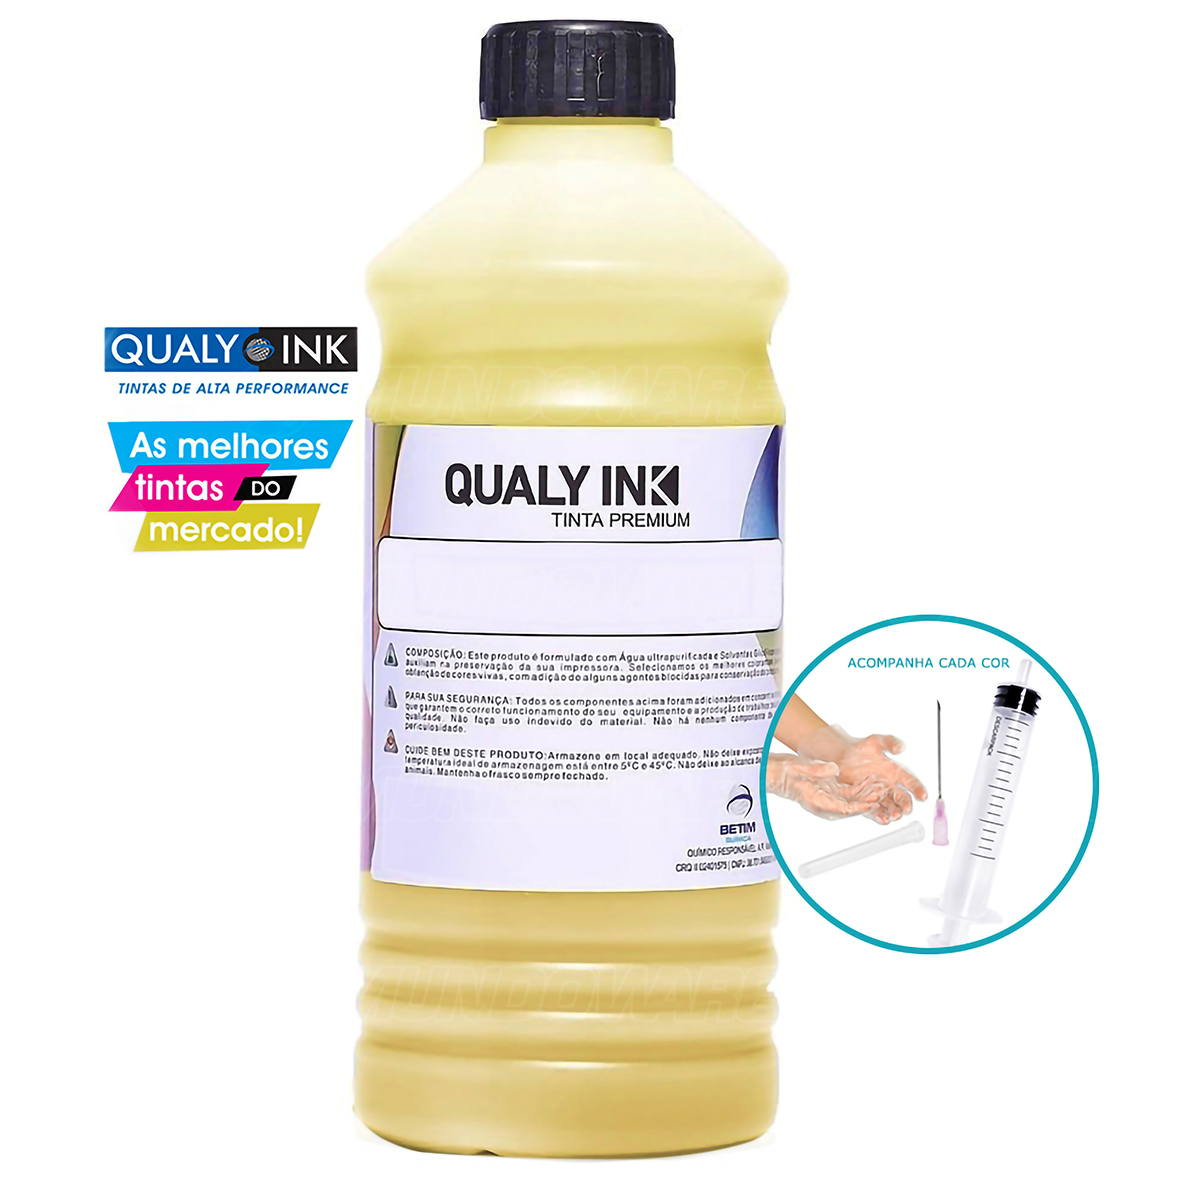 Tinta Corante Qualy-Ink para Impressora Brother MFC-J430w J6710dw J6510dw DCP-165c 385c 585cw Amarelo Refil 1L